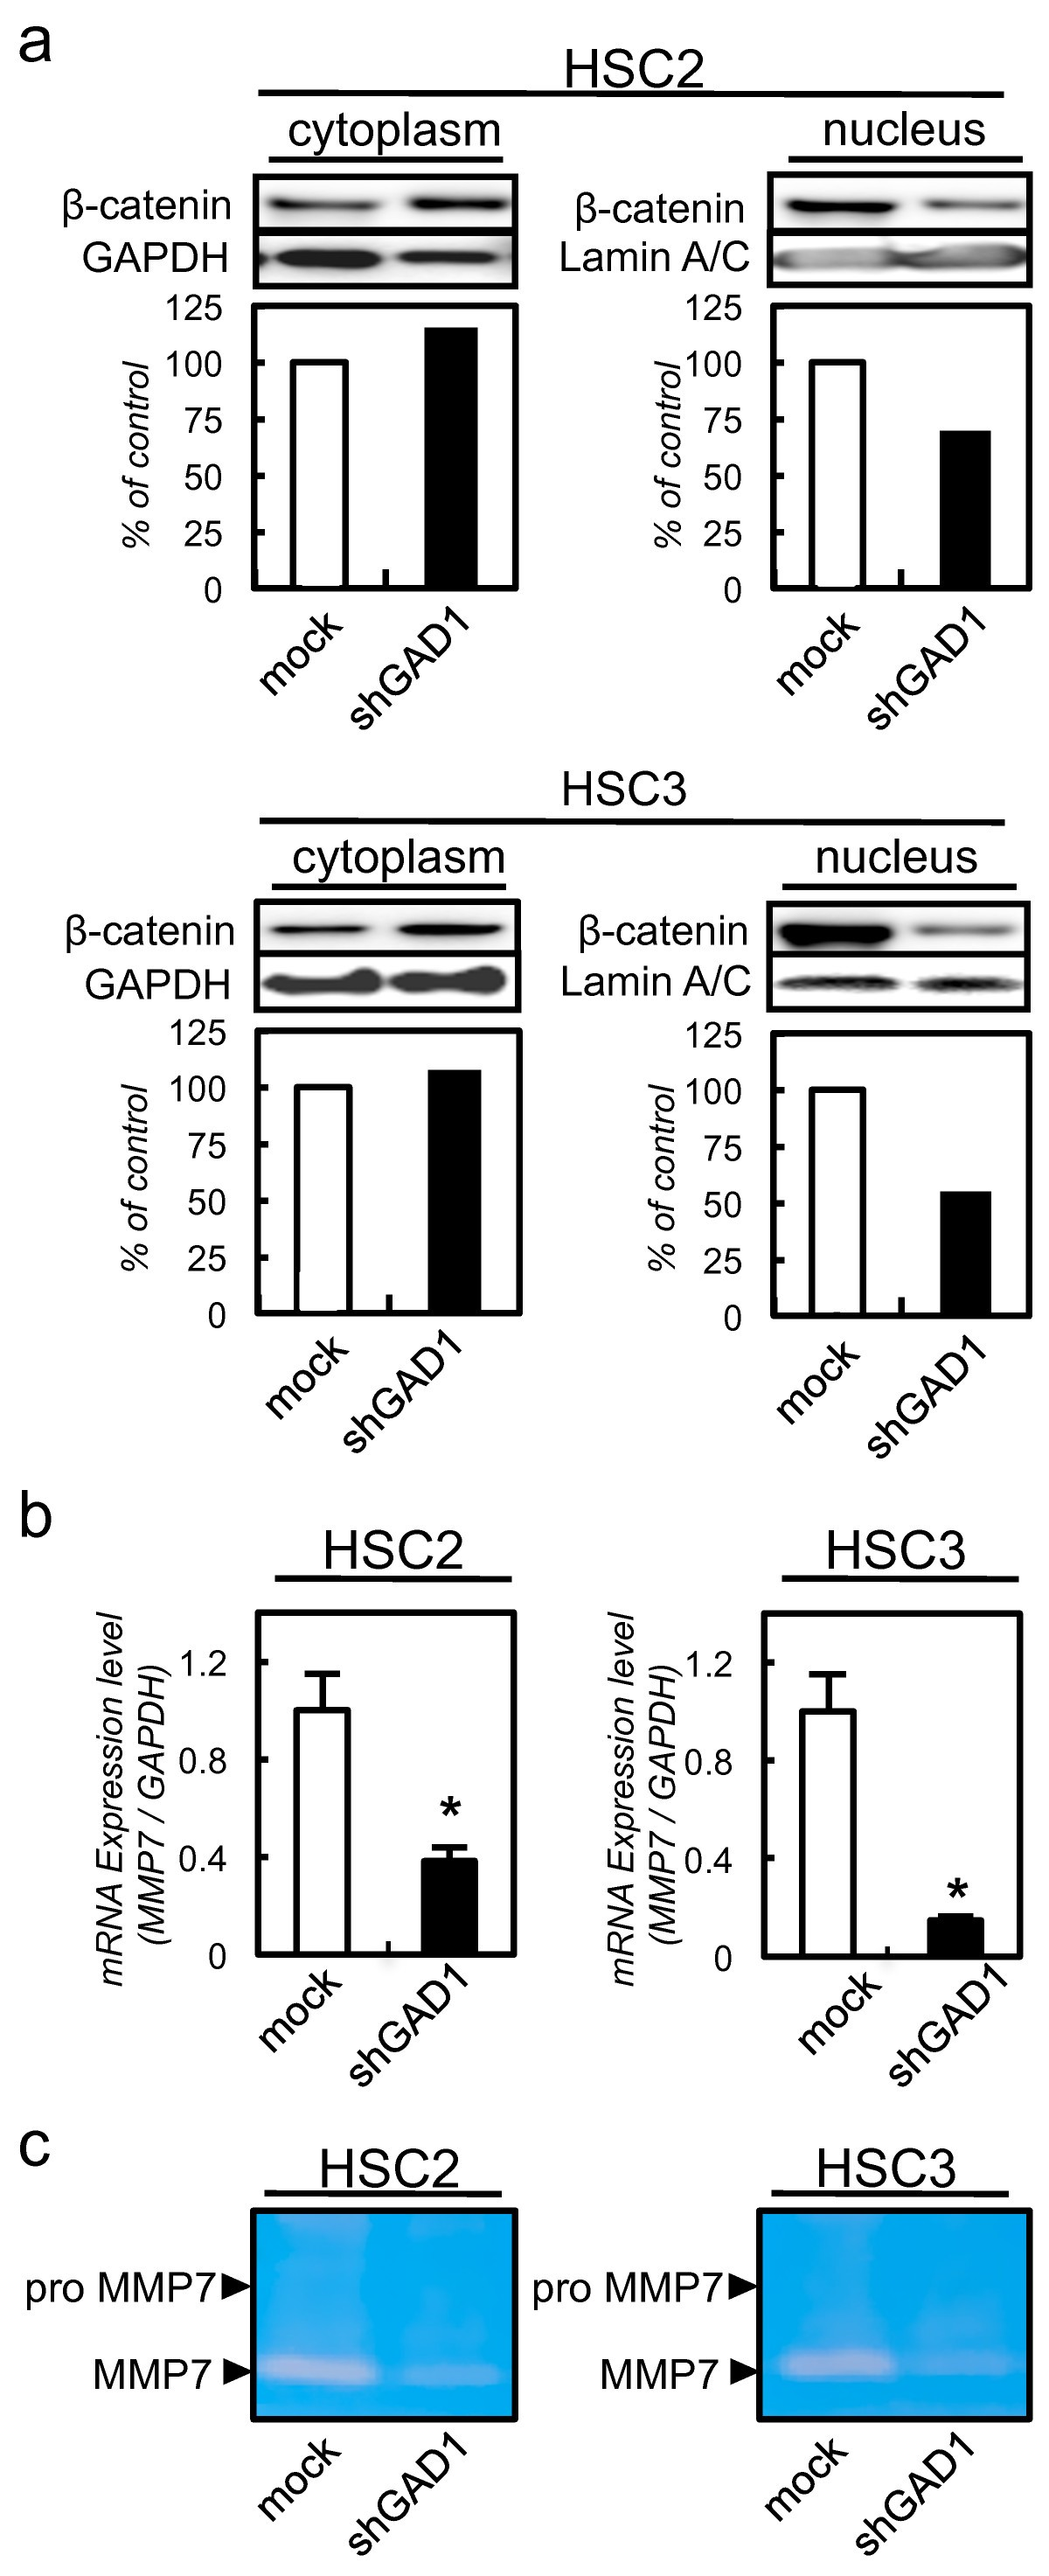 Glutamate Acid Decarboxylase 1 Promotes Metastasis Of Human Oral Tac 48 Refrigeration Wiring Diagram Figure 3